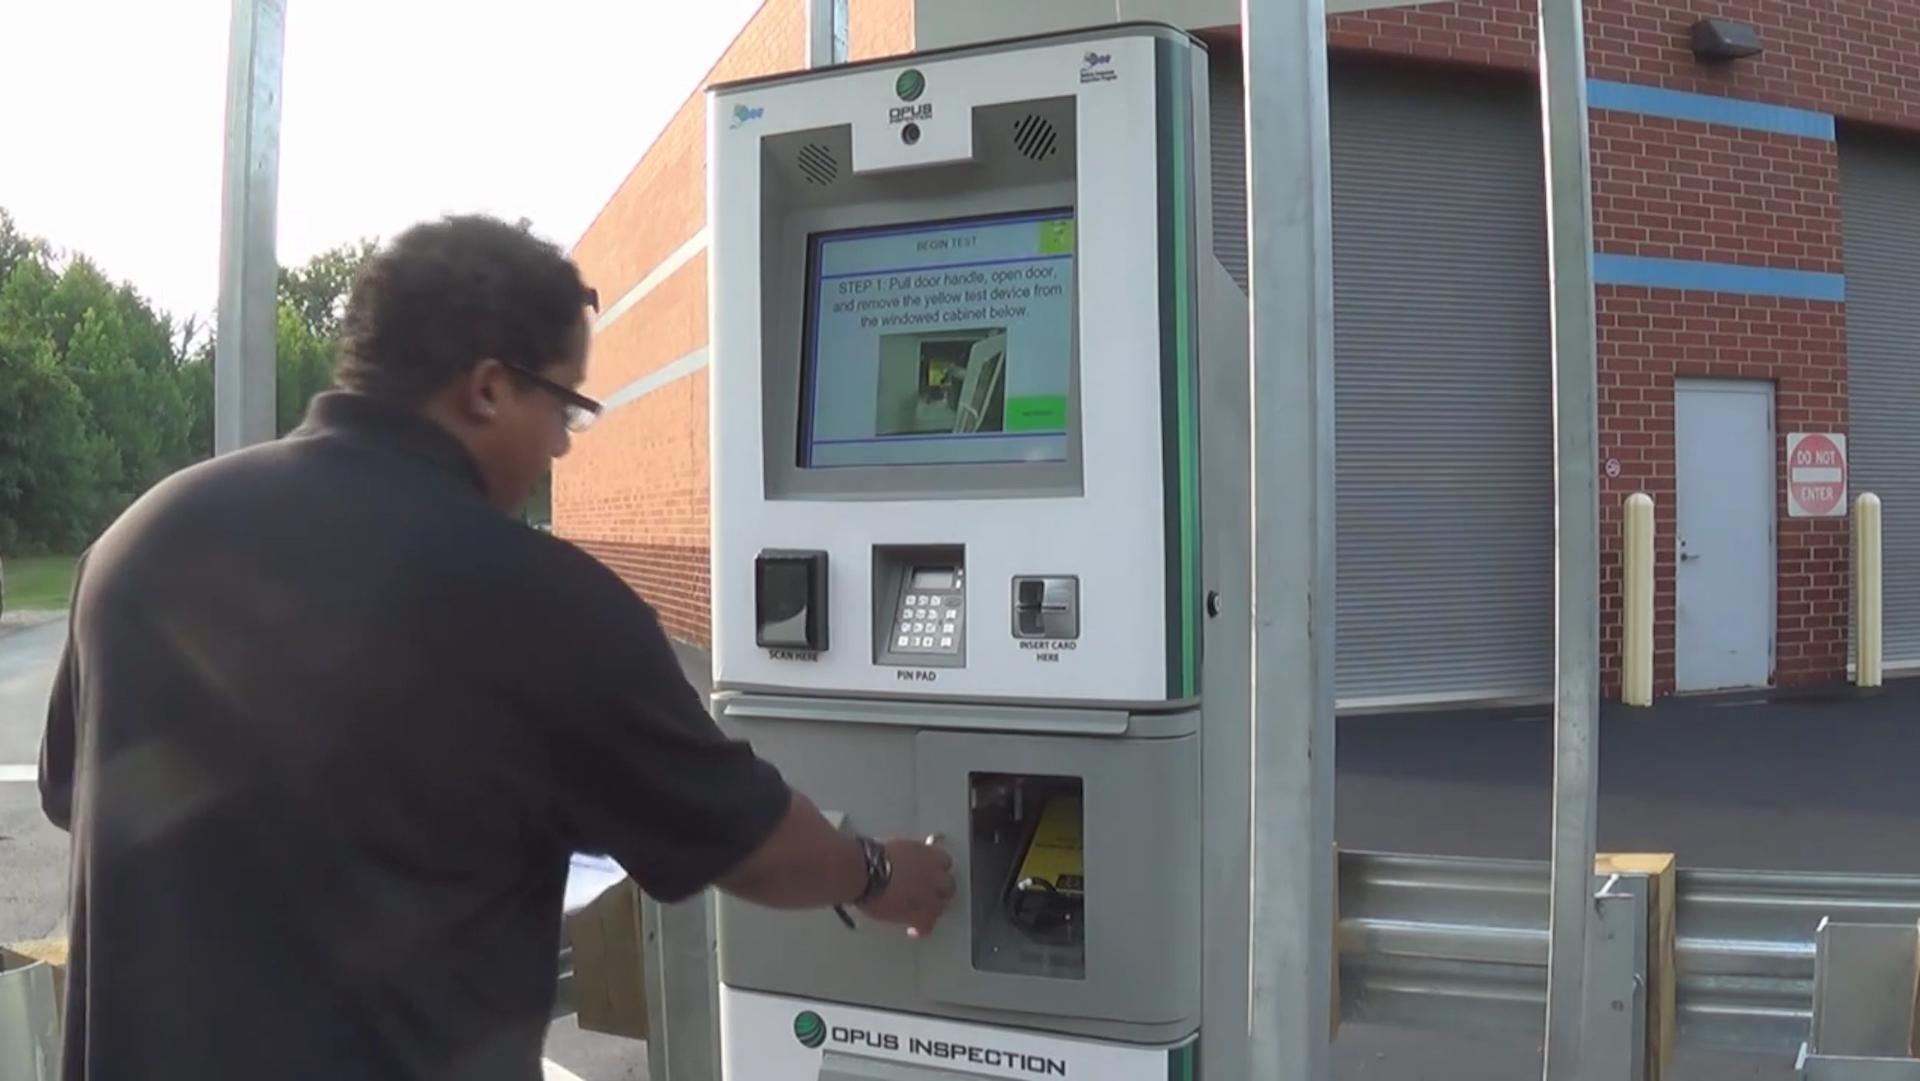 Maryland's vehicle emissions tests kiosk tutorial